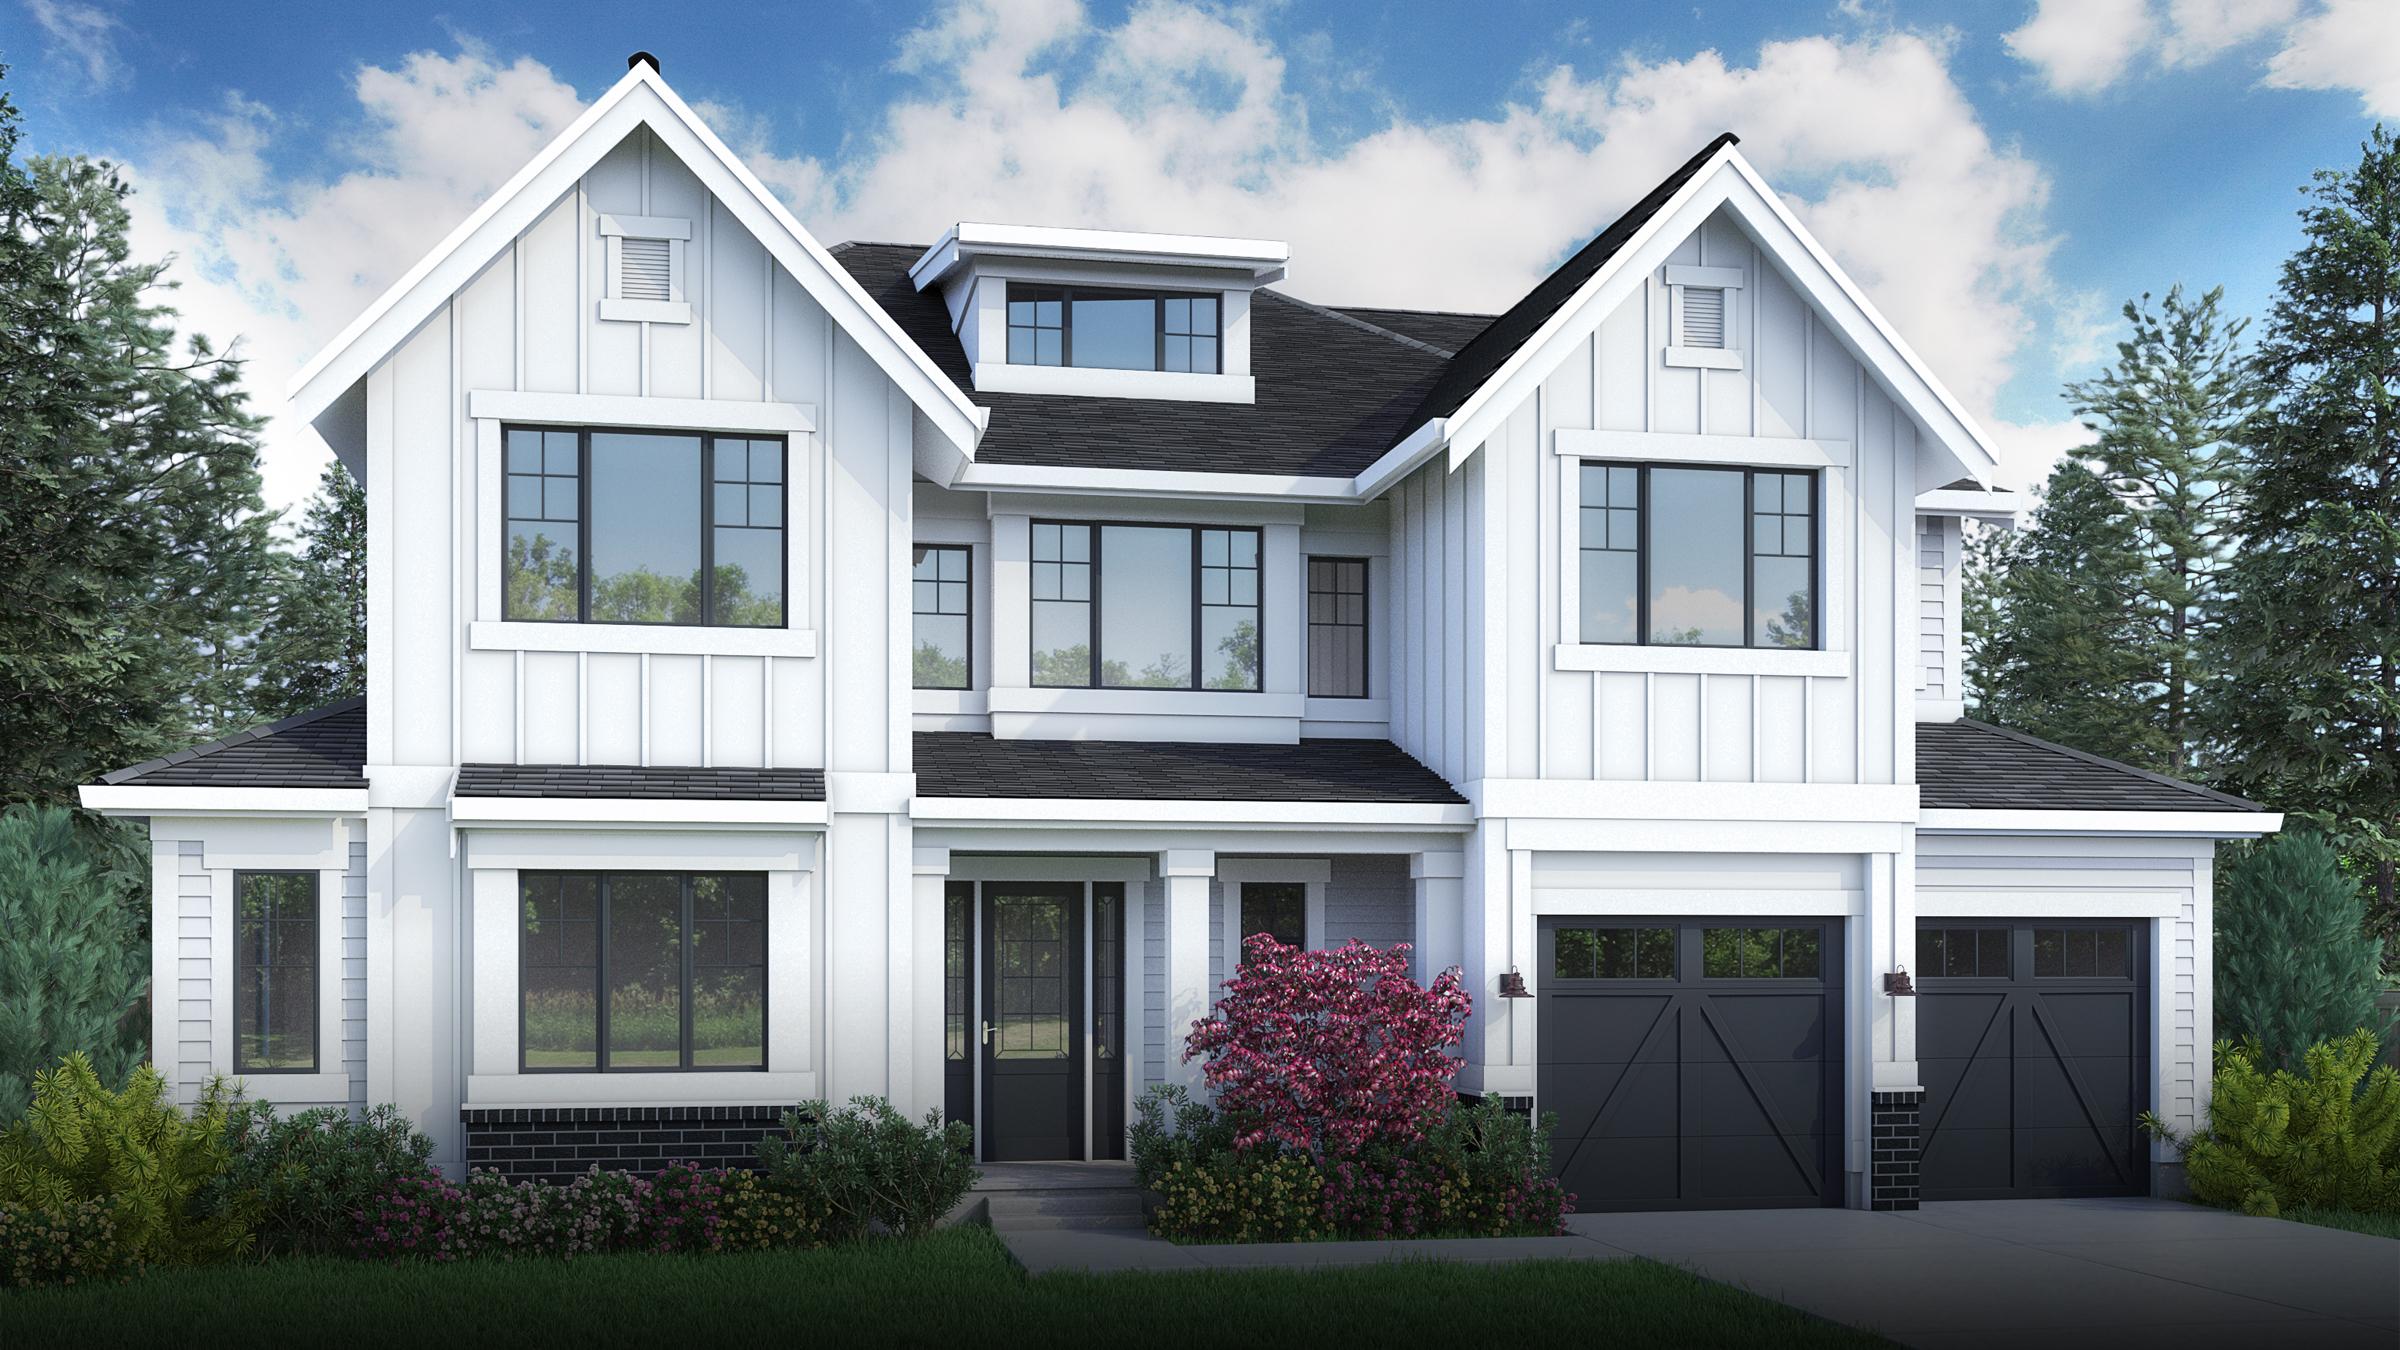 16XX 105th Avenue SE | Bellevue 5 Beds, 5 Baths, 4,999 SF | Enatai